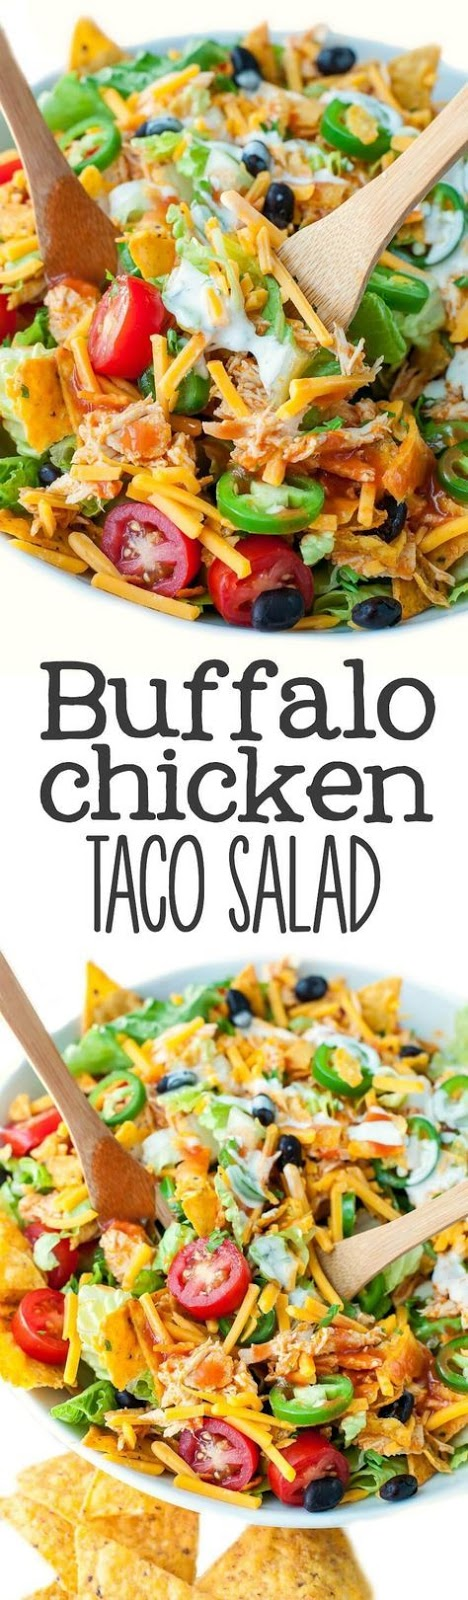 Buffalo Chicken Taco Salad Recipe